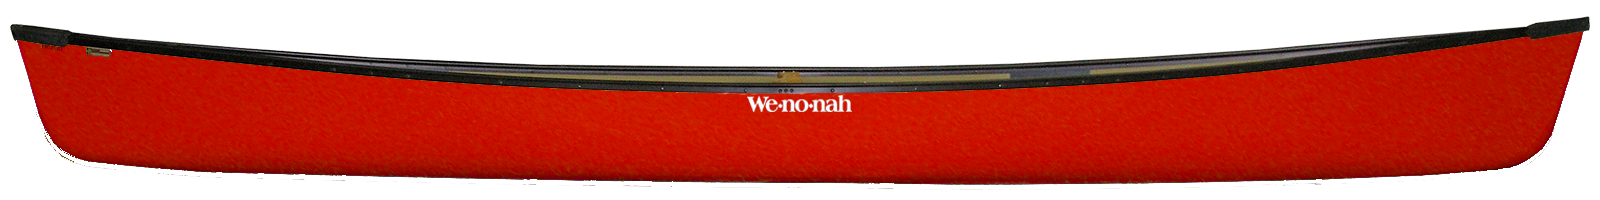 Wenonah Prospector 16 - IN STOCK